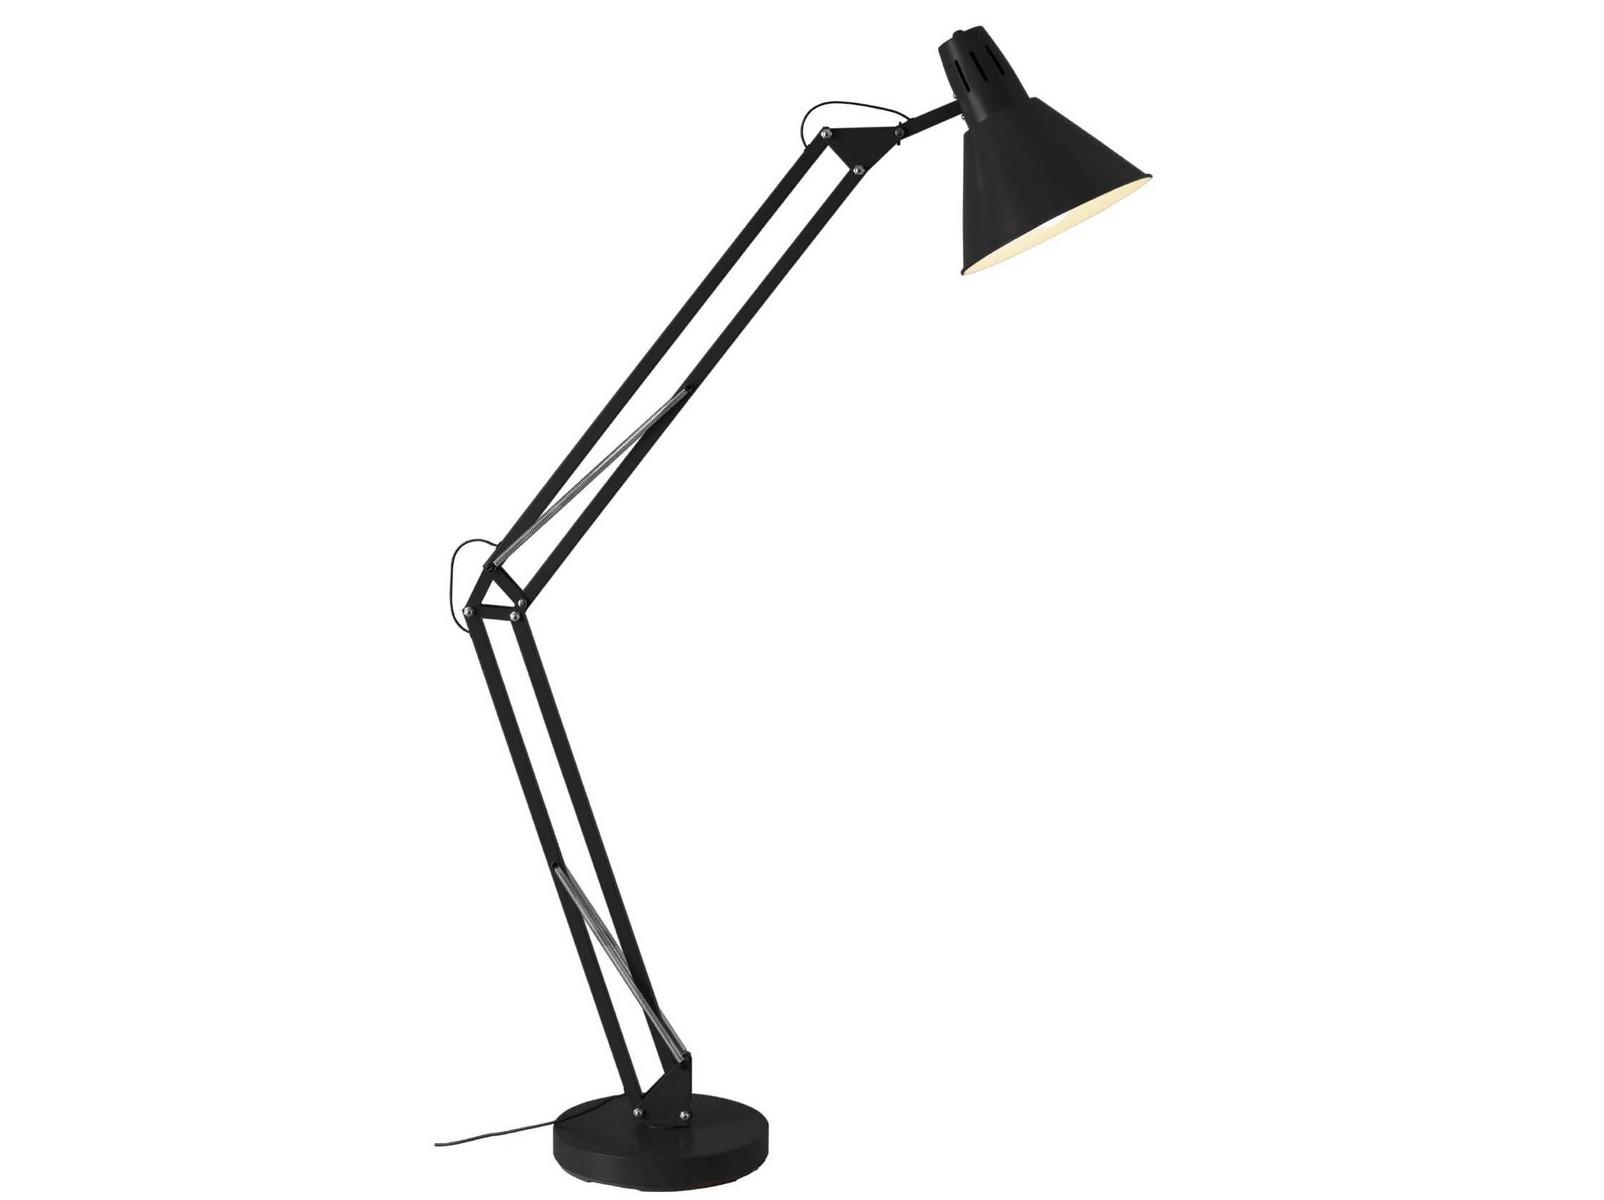 Лампа напольная WinstonТоршеры<br>&amp;lt;div&amp;gt;Вид цоколя: Е27&amp;lt;/div&amp;gt;&amp;lt;div&amp;gt;Мощность лампы: 60W&amp;lt;/div&amp;gt;&amp;lt;div&amp;gt;Количество ламп: 1&amp;lt;/div&amp;gt;&amp;lt;div&amp;gt;Наличие ламп: нет&amp;lt;/div&amp;gt;<br><br>Material: Металл<br>Height см: 180<br>Diameter см: 30